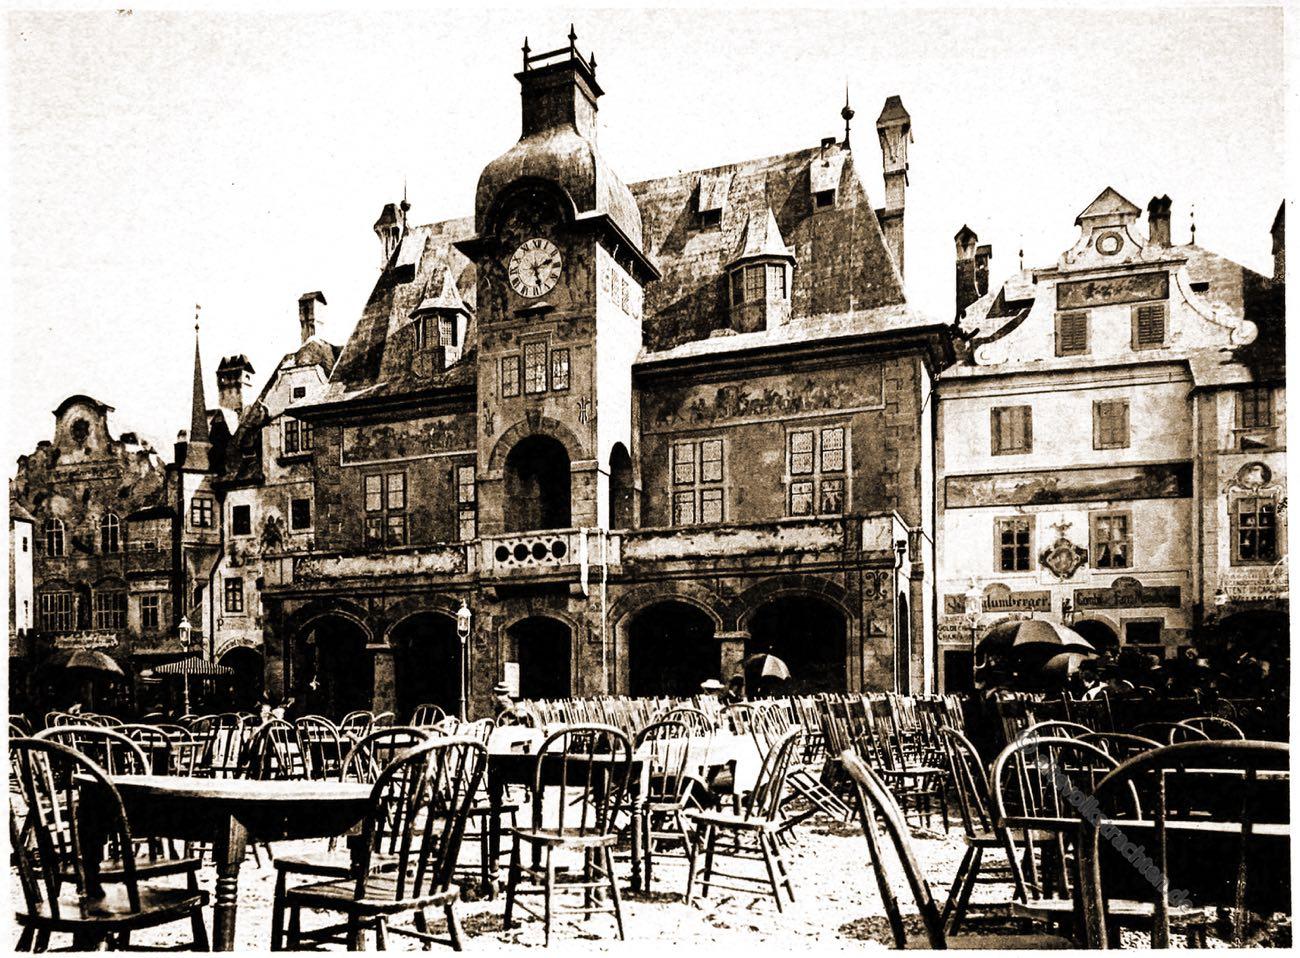 Rathaus, City Hall, Alt-Wien, Columbian Exposition, Chicago, Adolph Wittemann, Stadtansicht